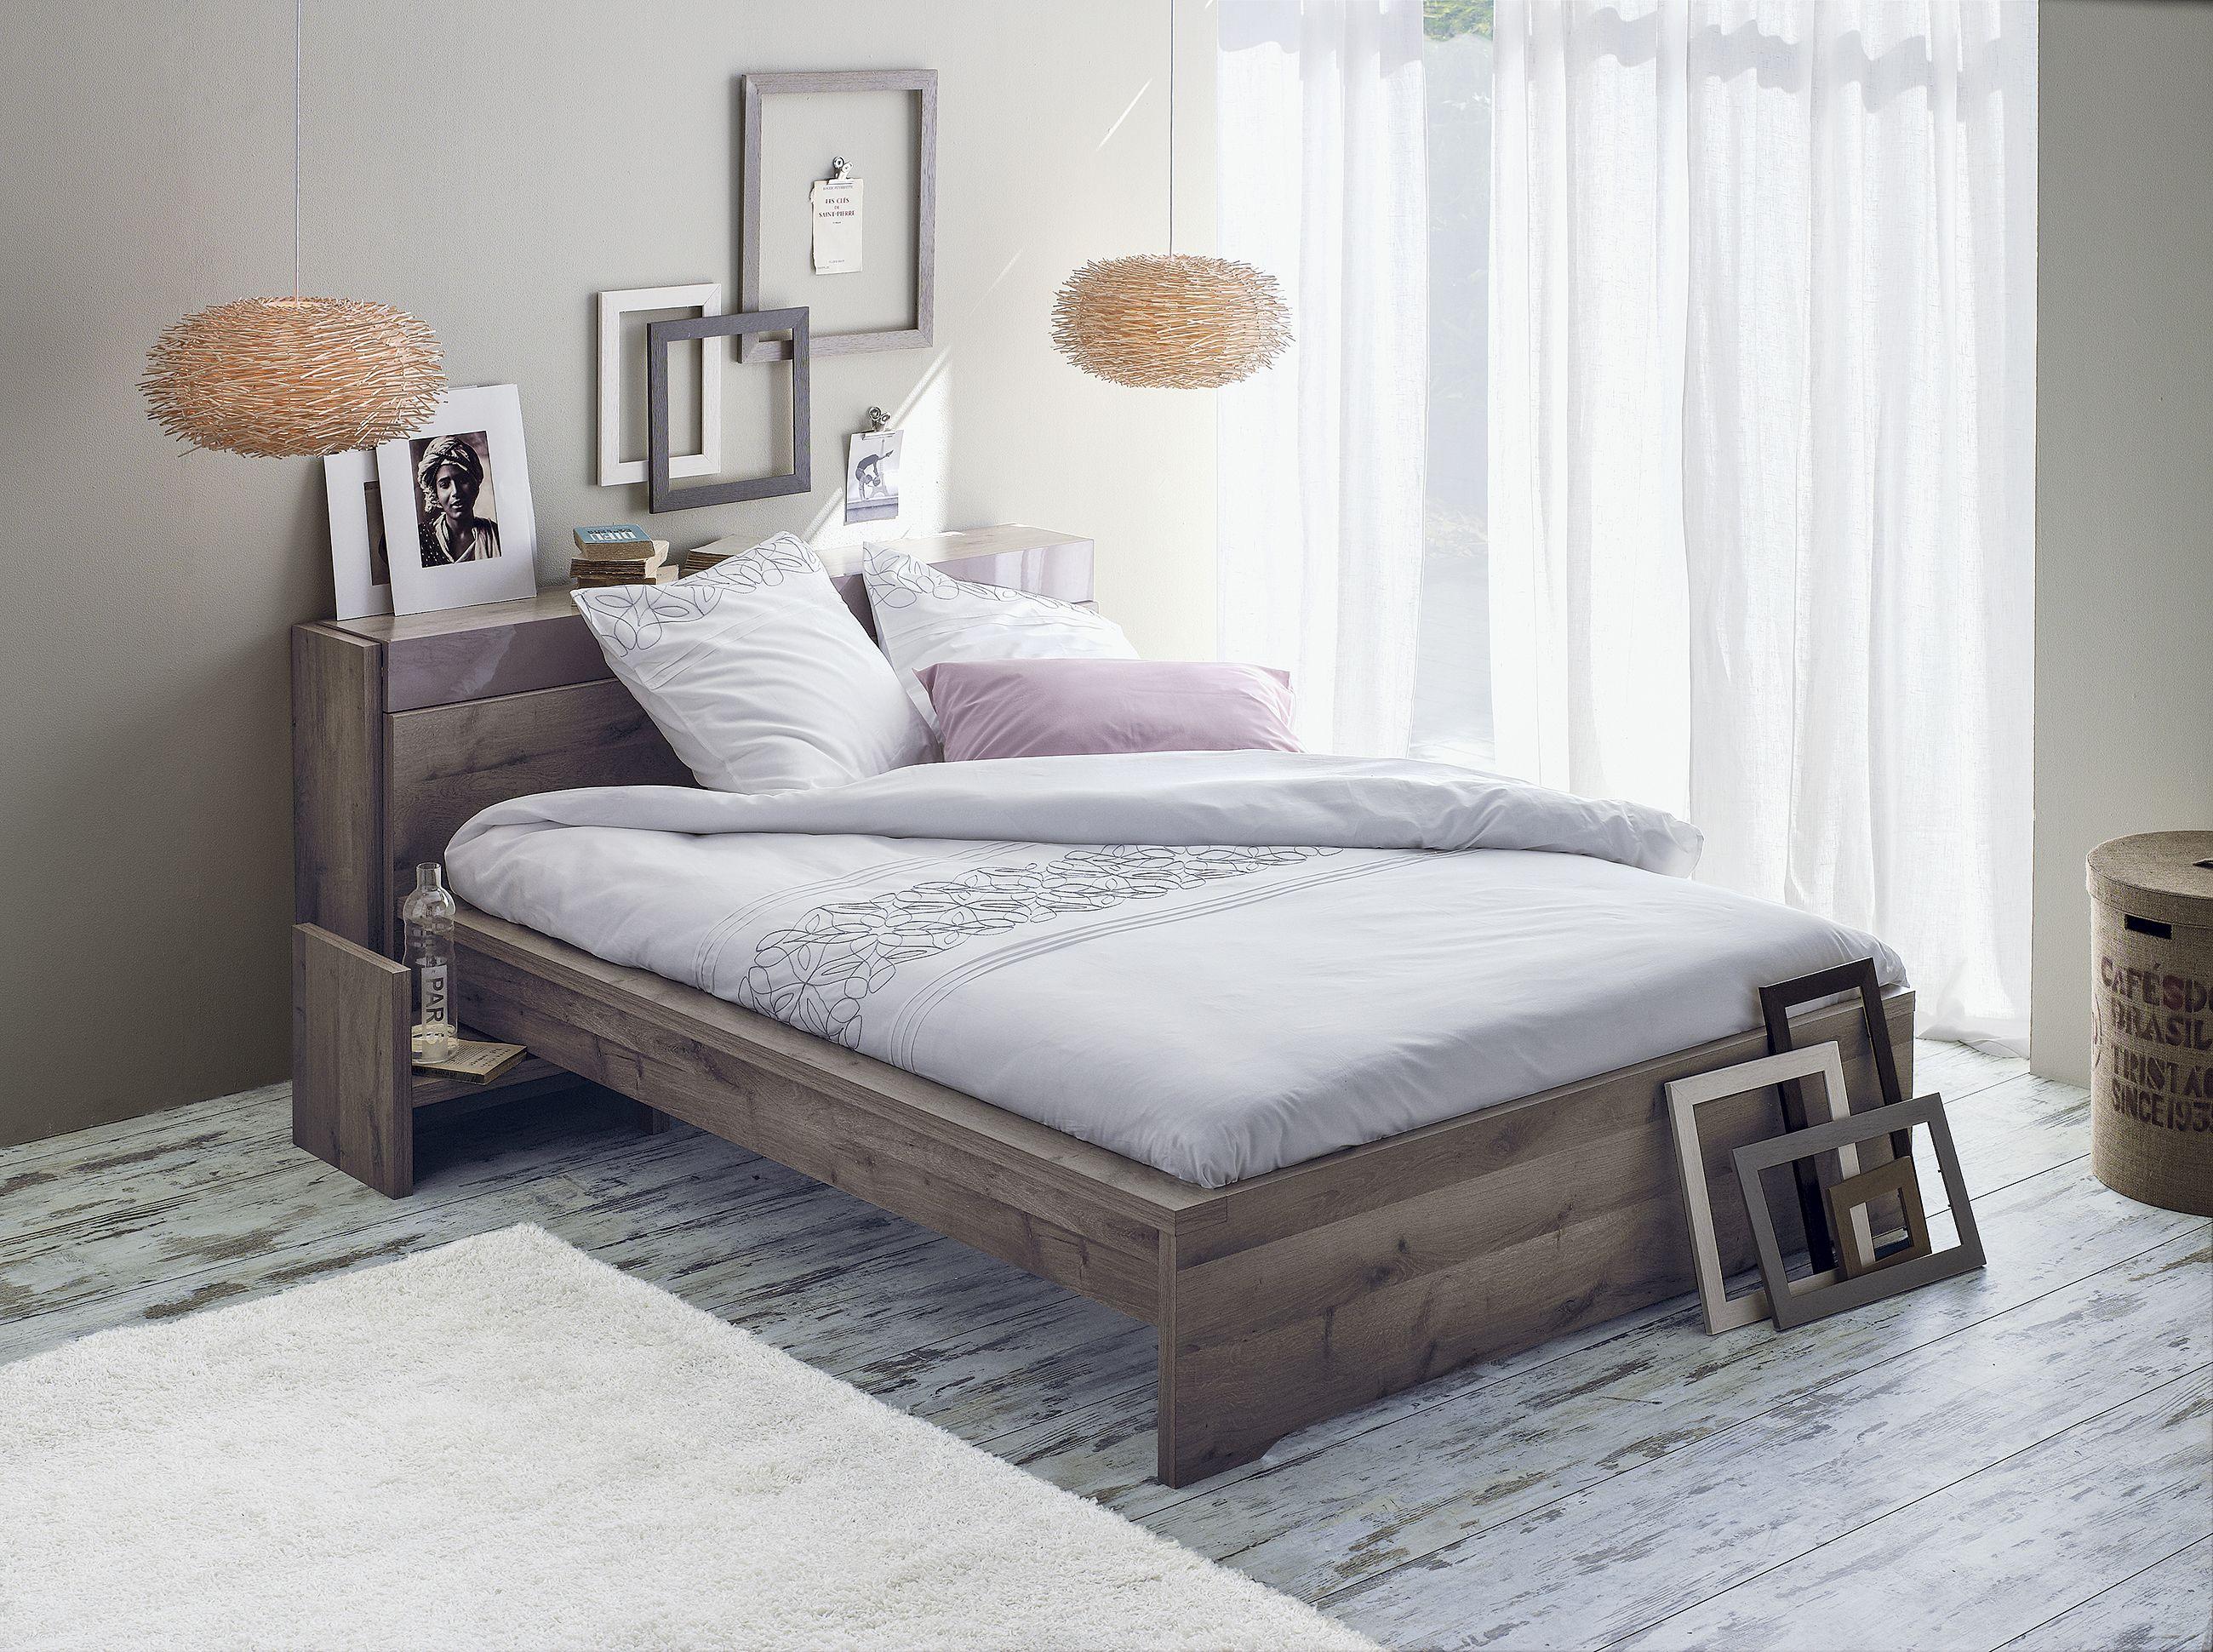 lit brooklyn sympa pinterest bureaus salons and lights. Black Bedroom Furniture Sets. Home Design Ideas